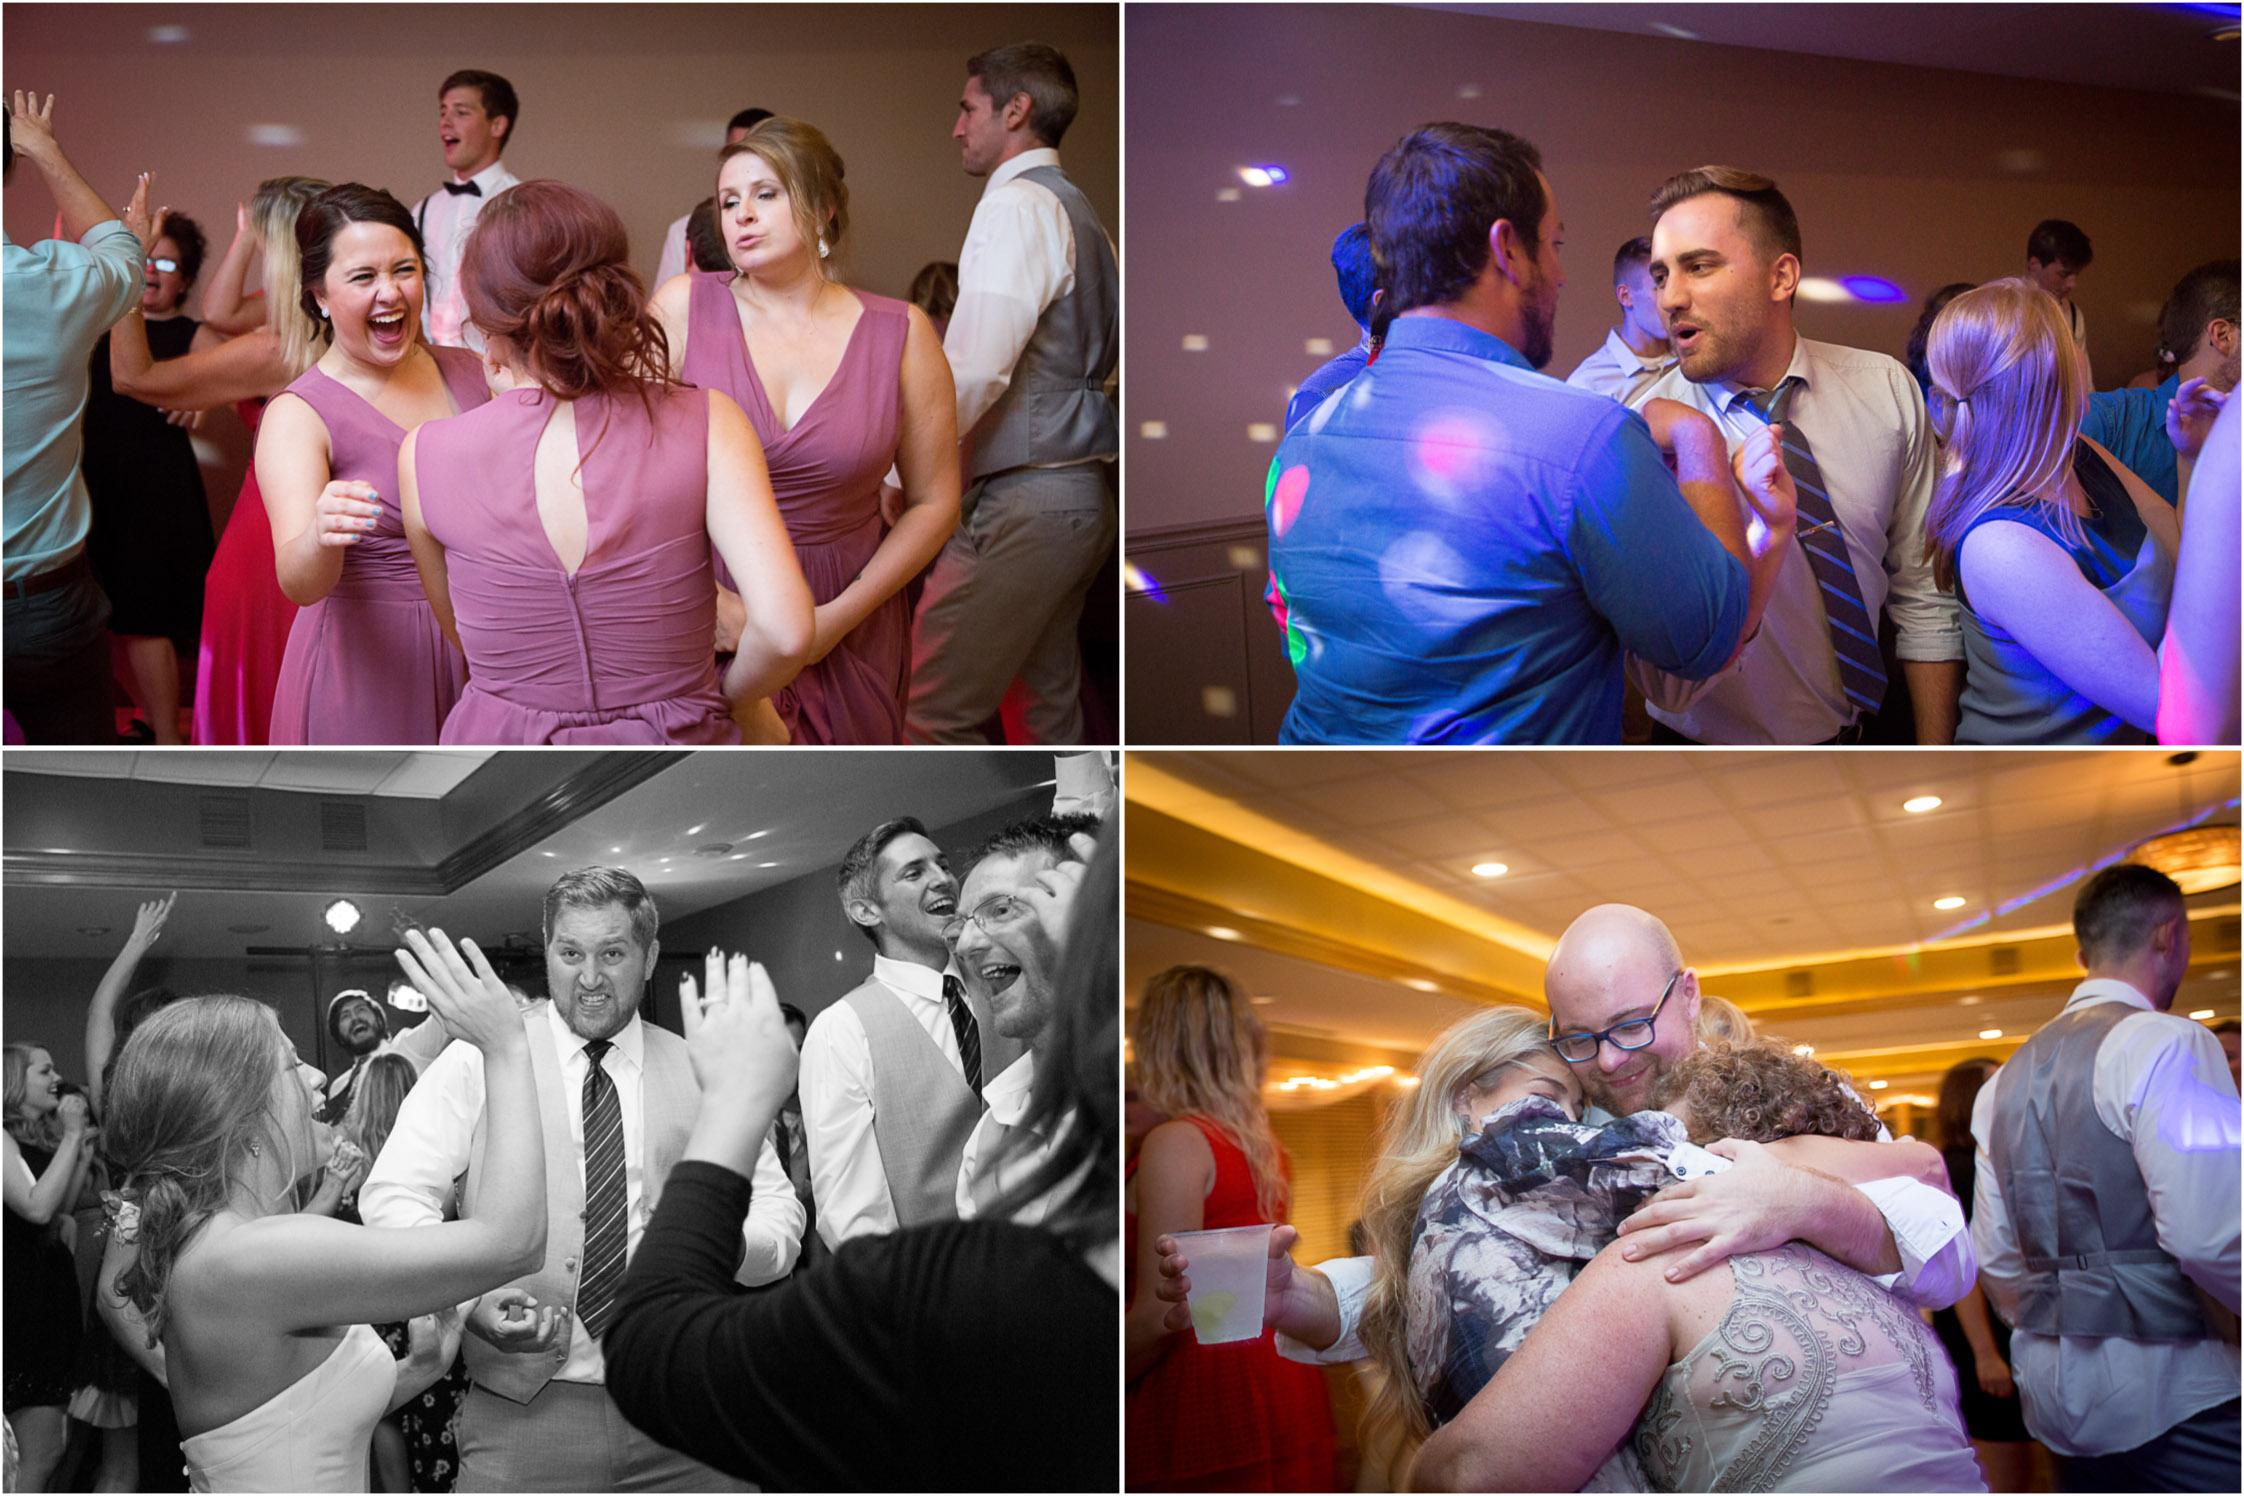 33-wedding-reception-dancing-fun-mahonen-photography.jpg